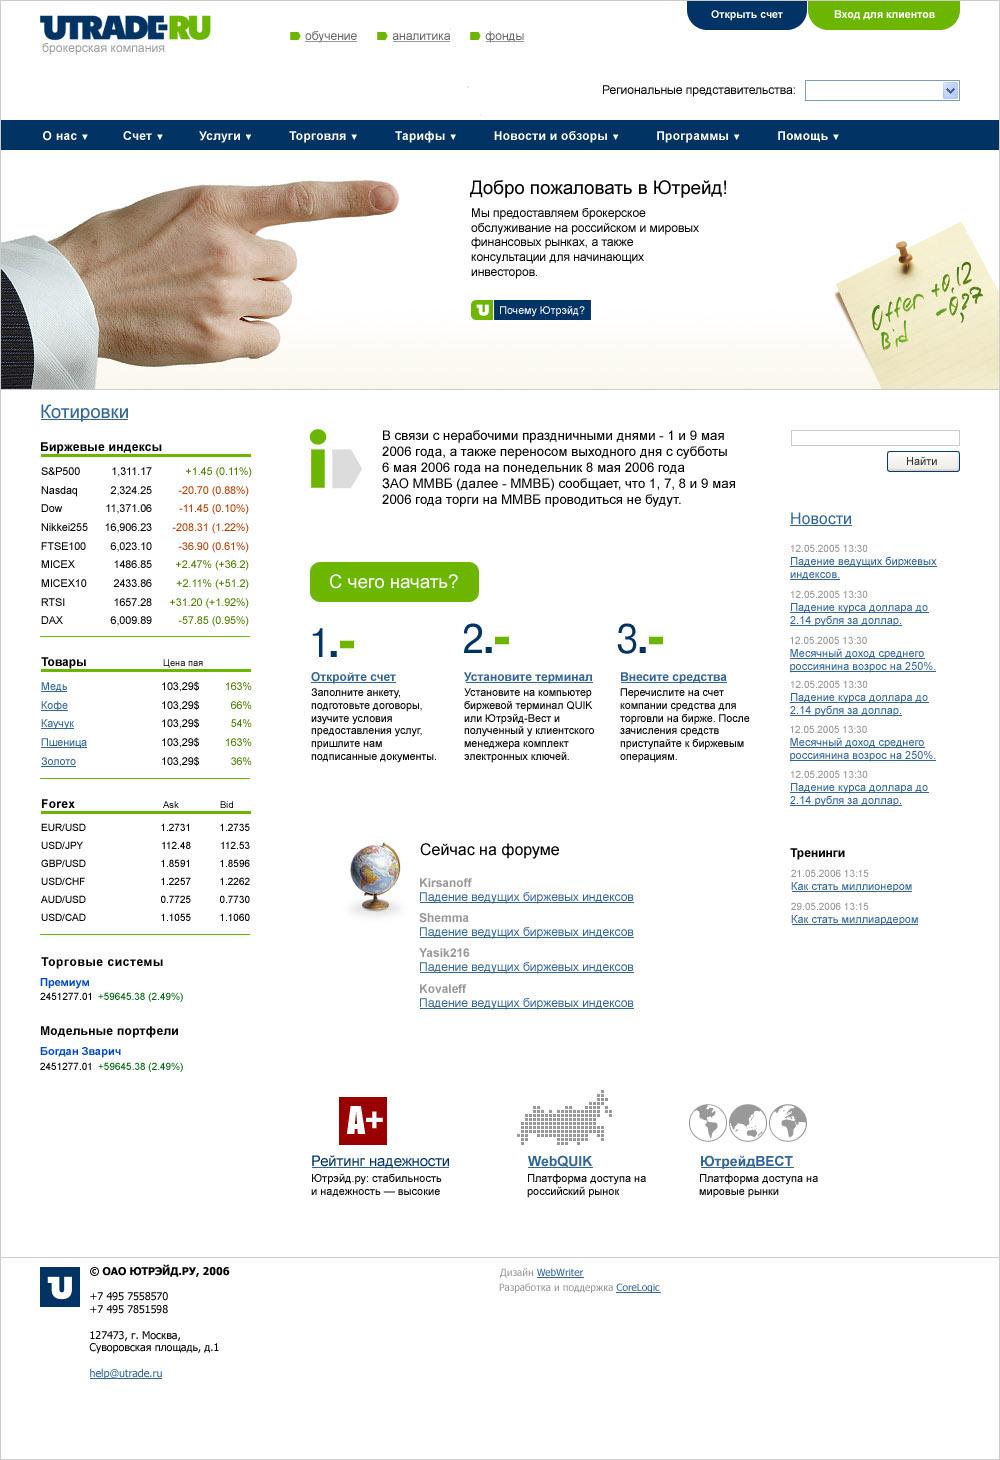 Дизайн сайта брокерской компании Utrade.ru